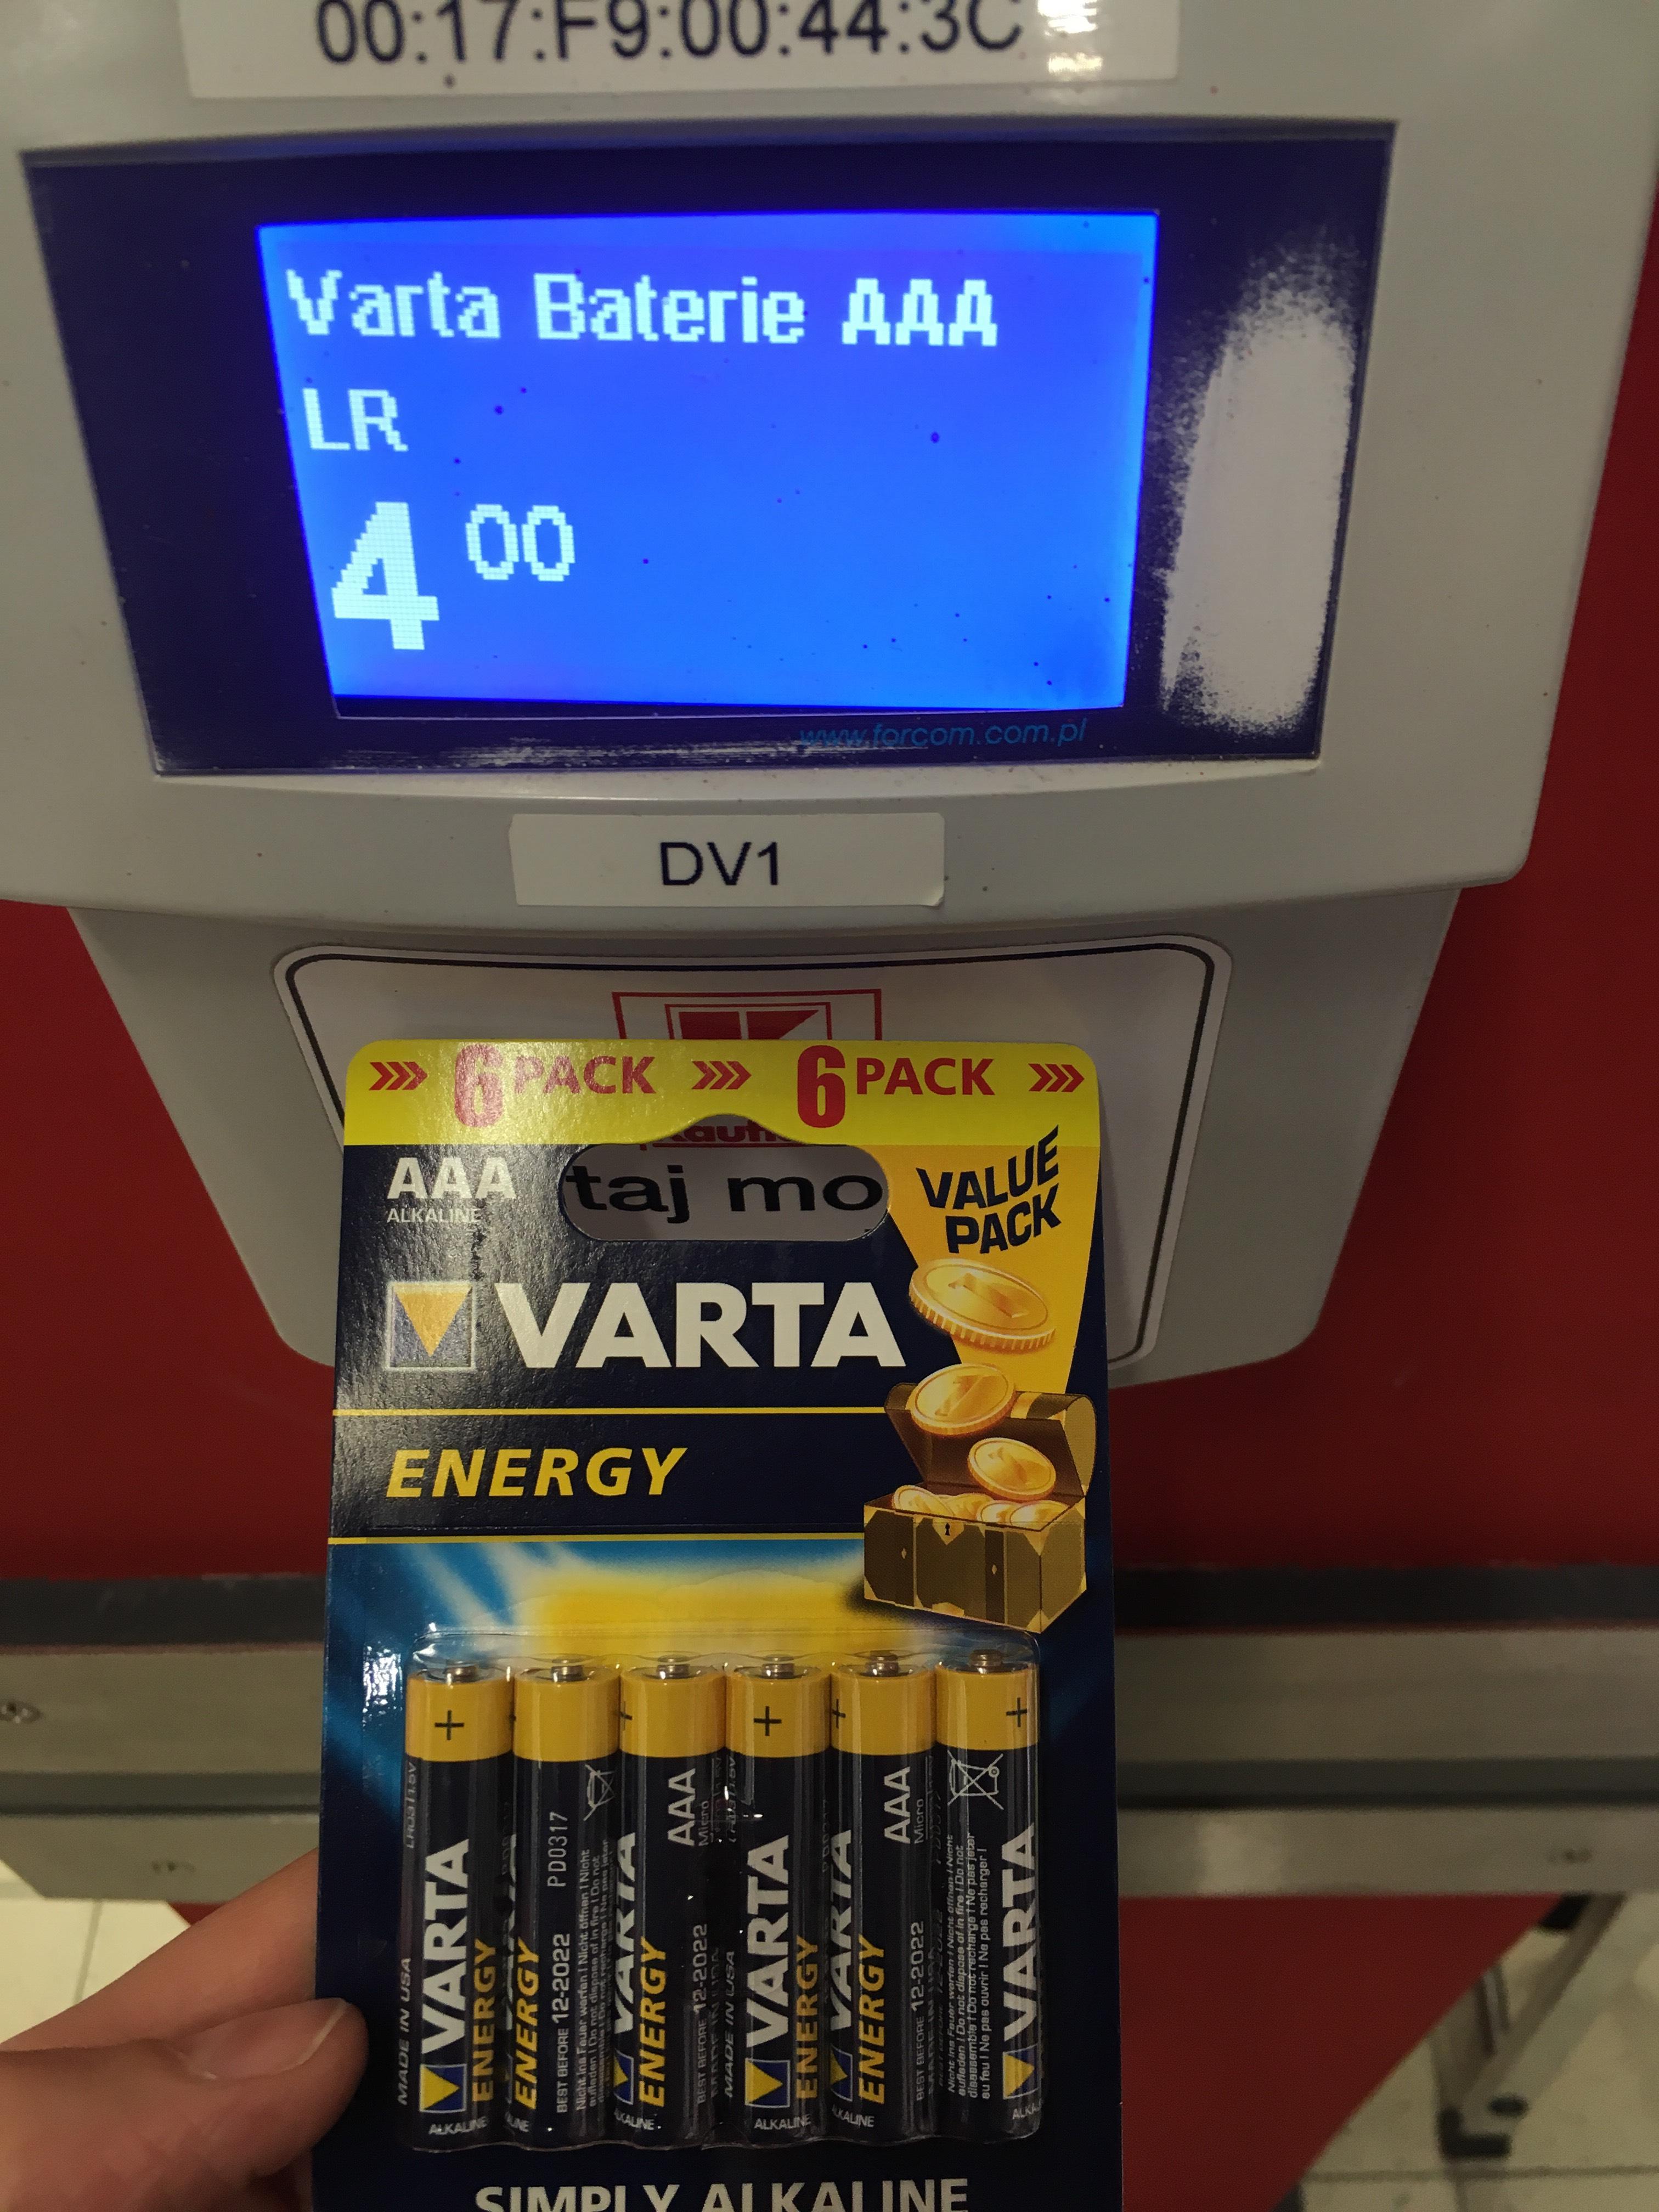 Baterie AAA Varta 6 pack  Kaufland